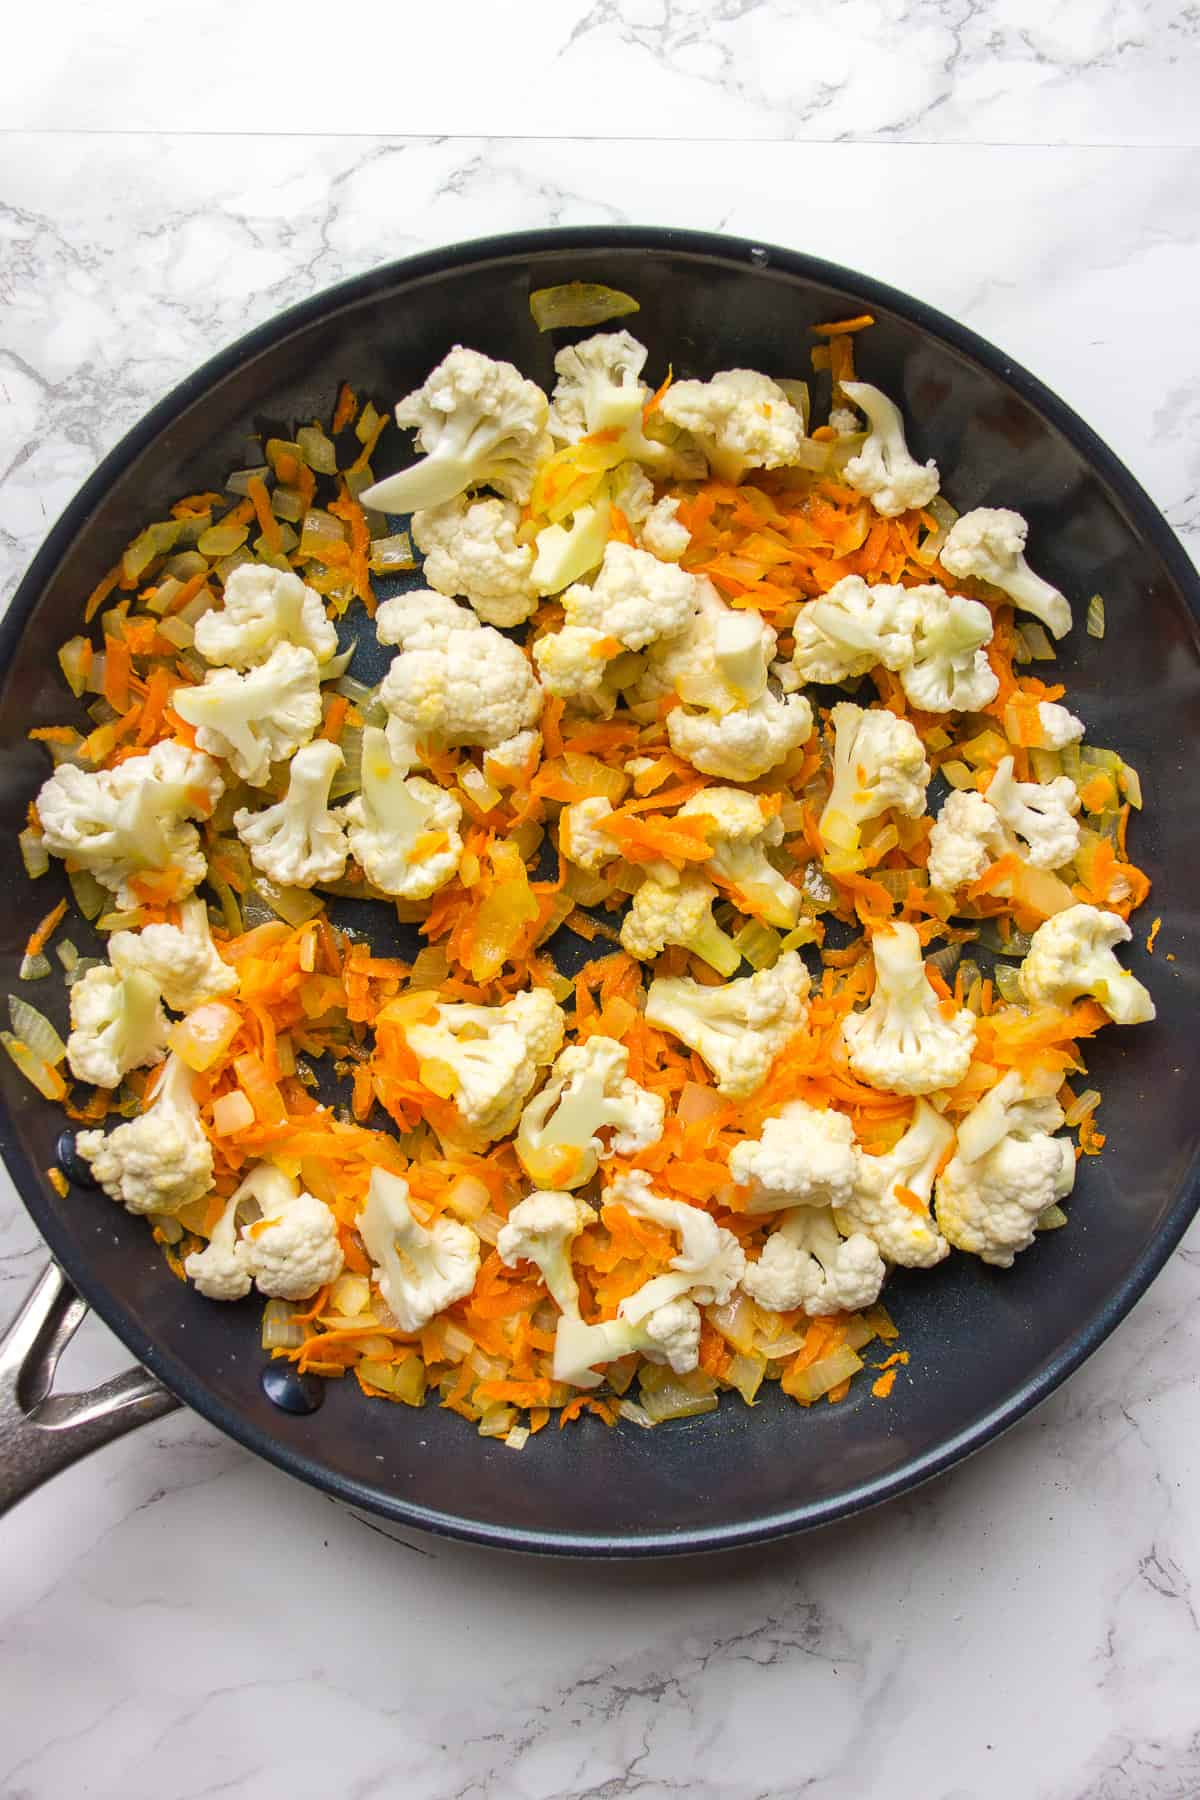 Sautéing cauliflower for the spring soup